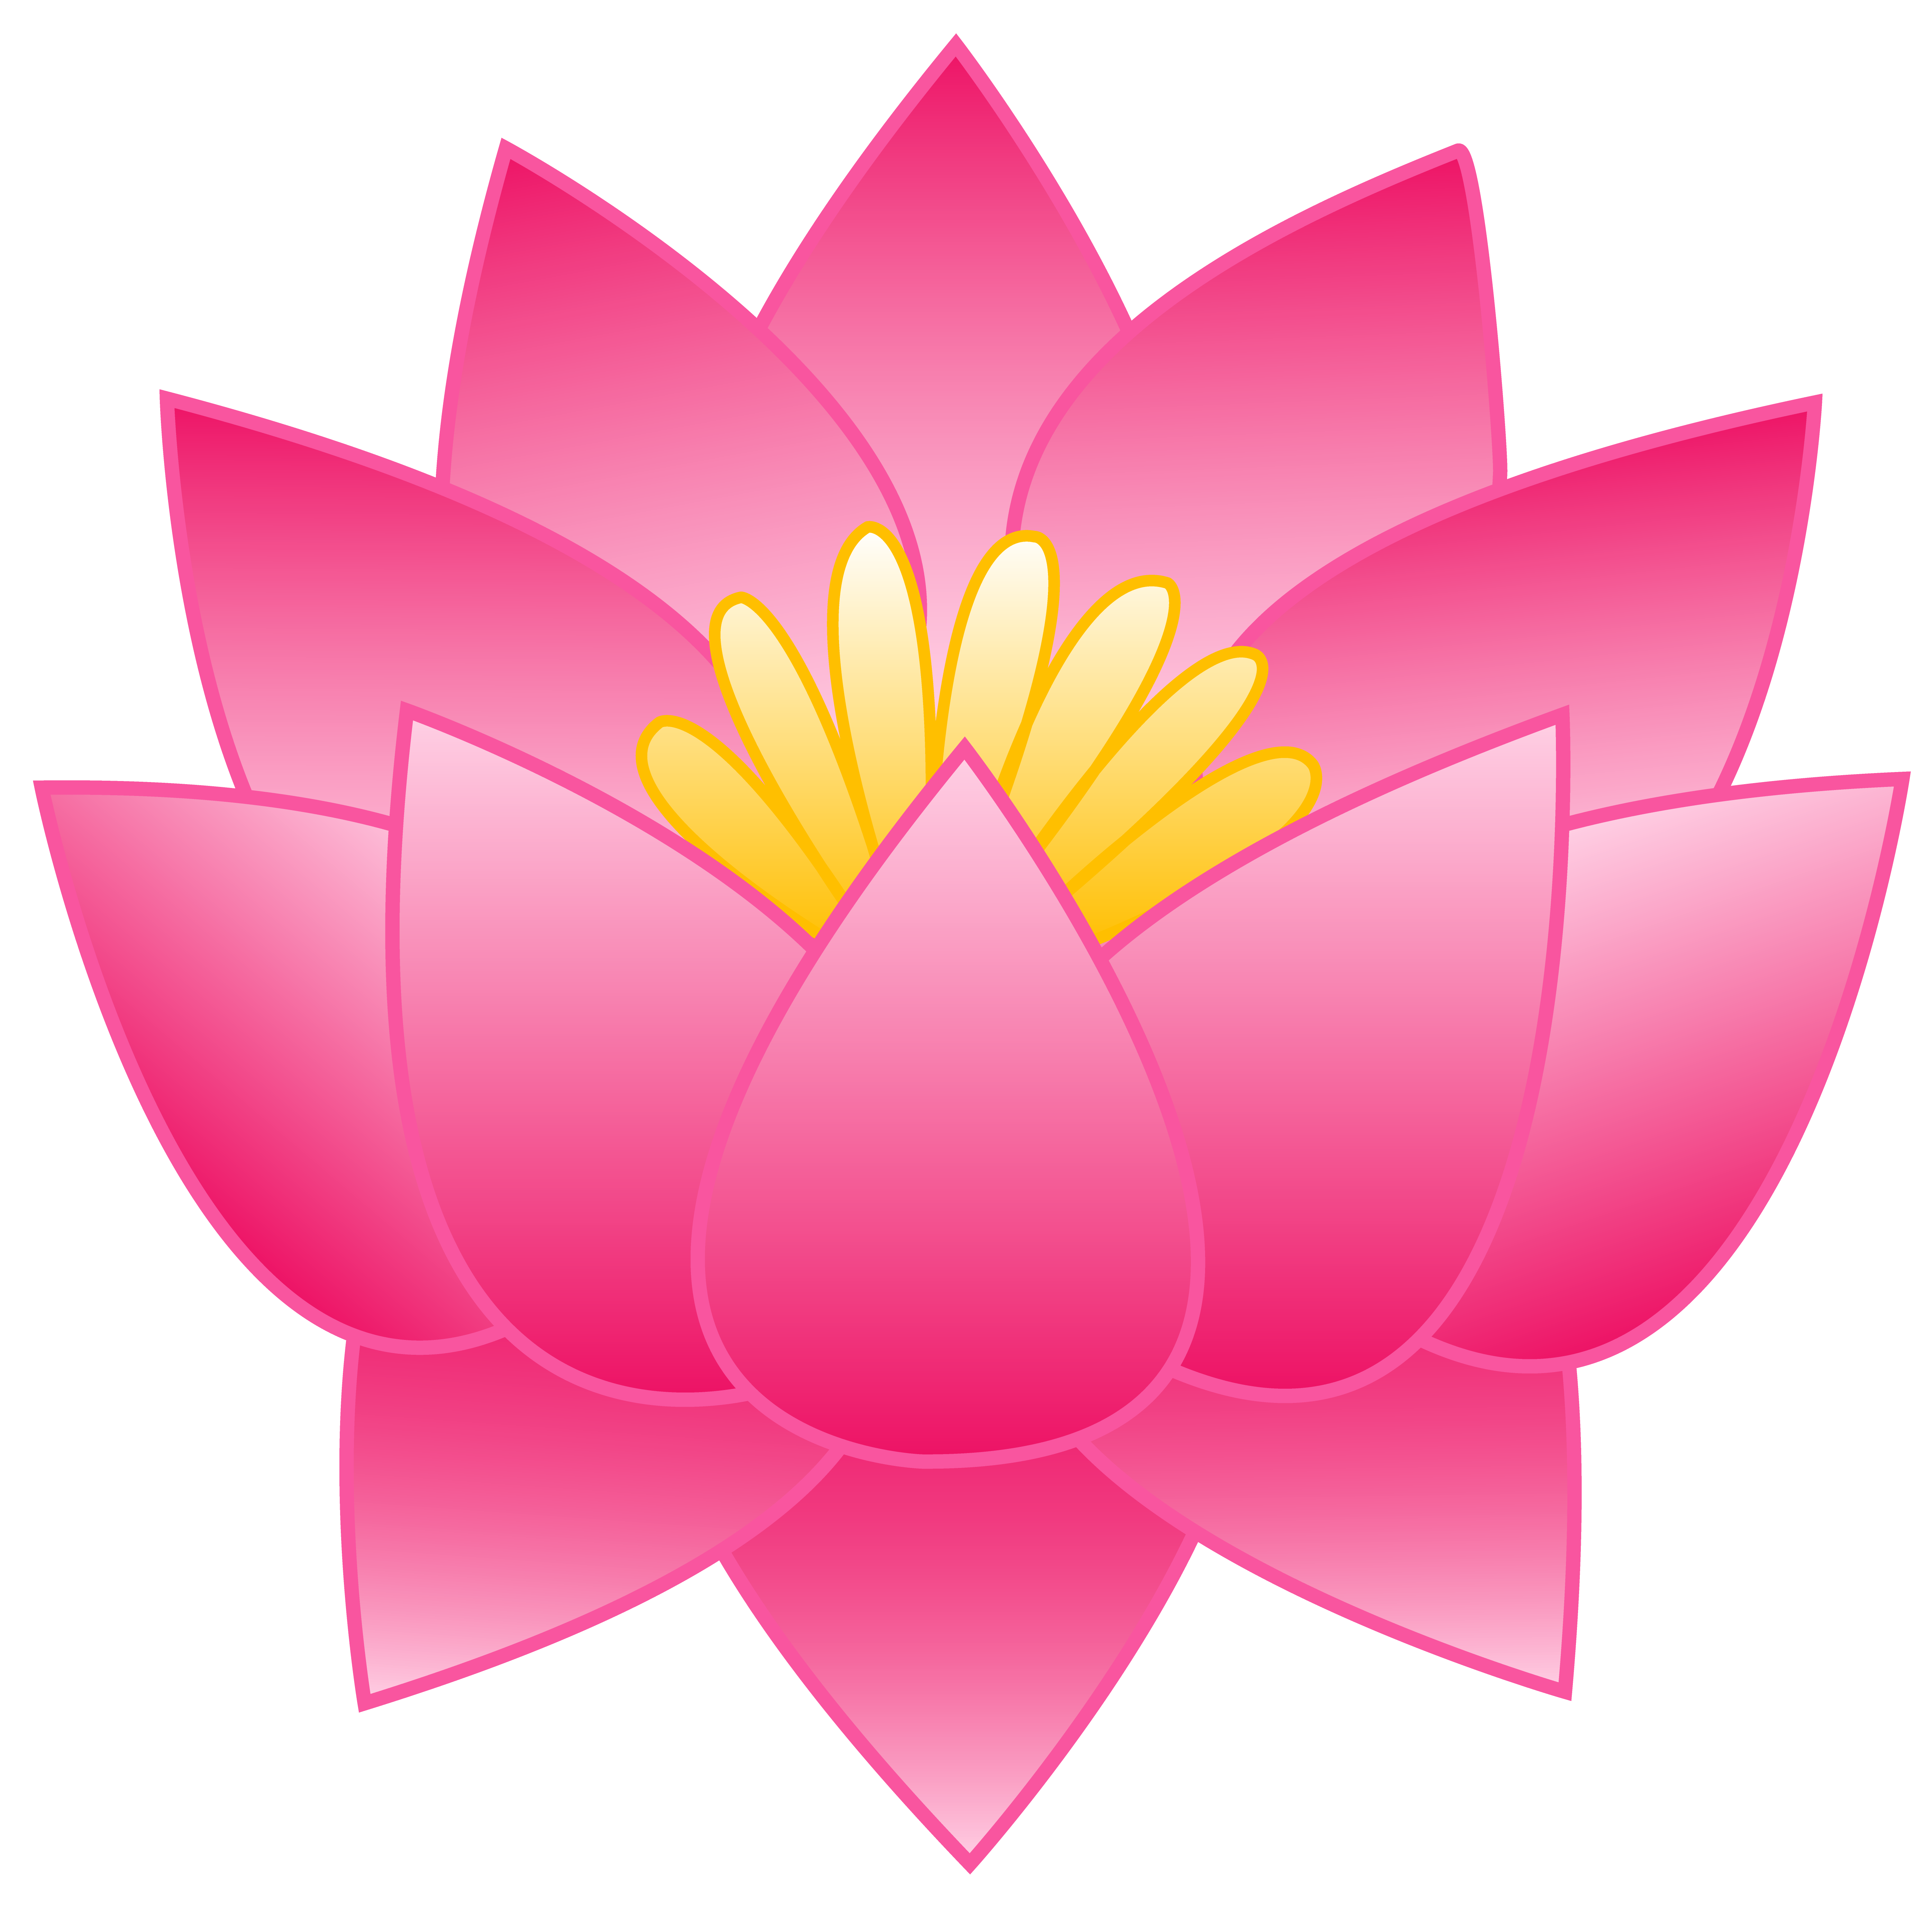 Lotus flower graphic png. Aquatic clipart at getdrawings